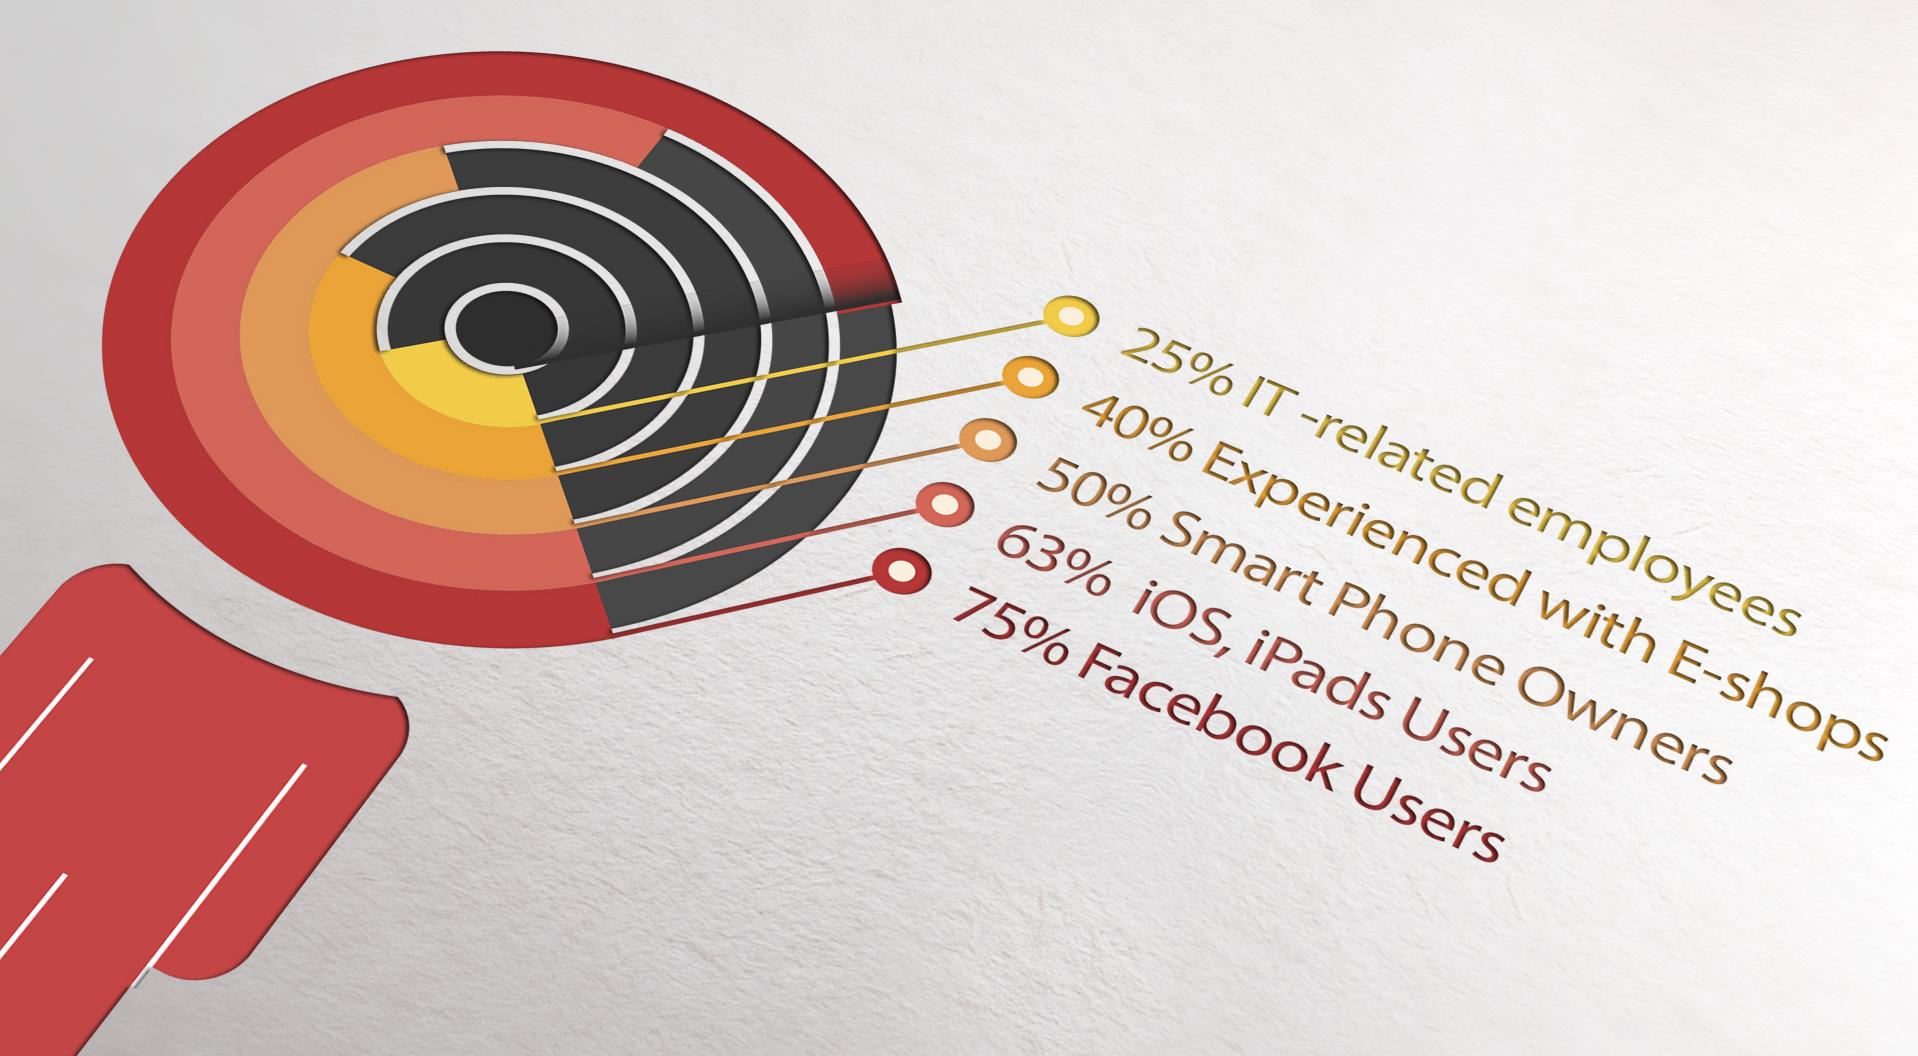 user-interface-design-process